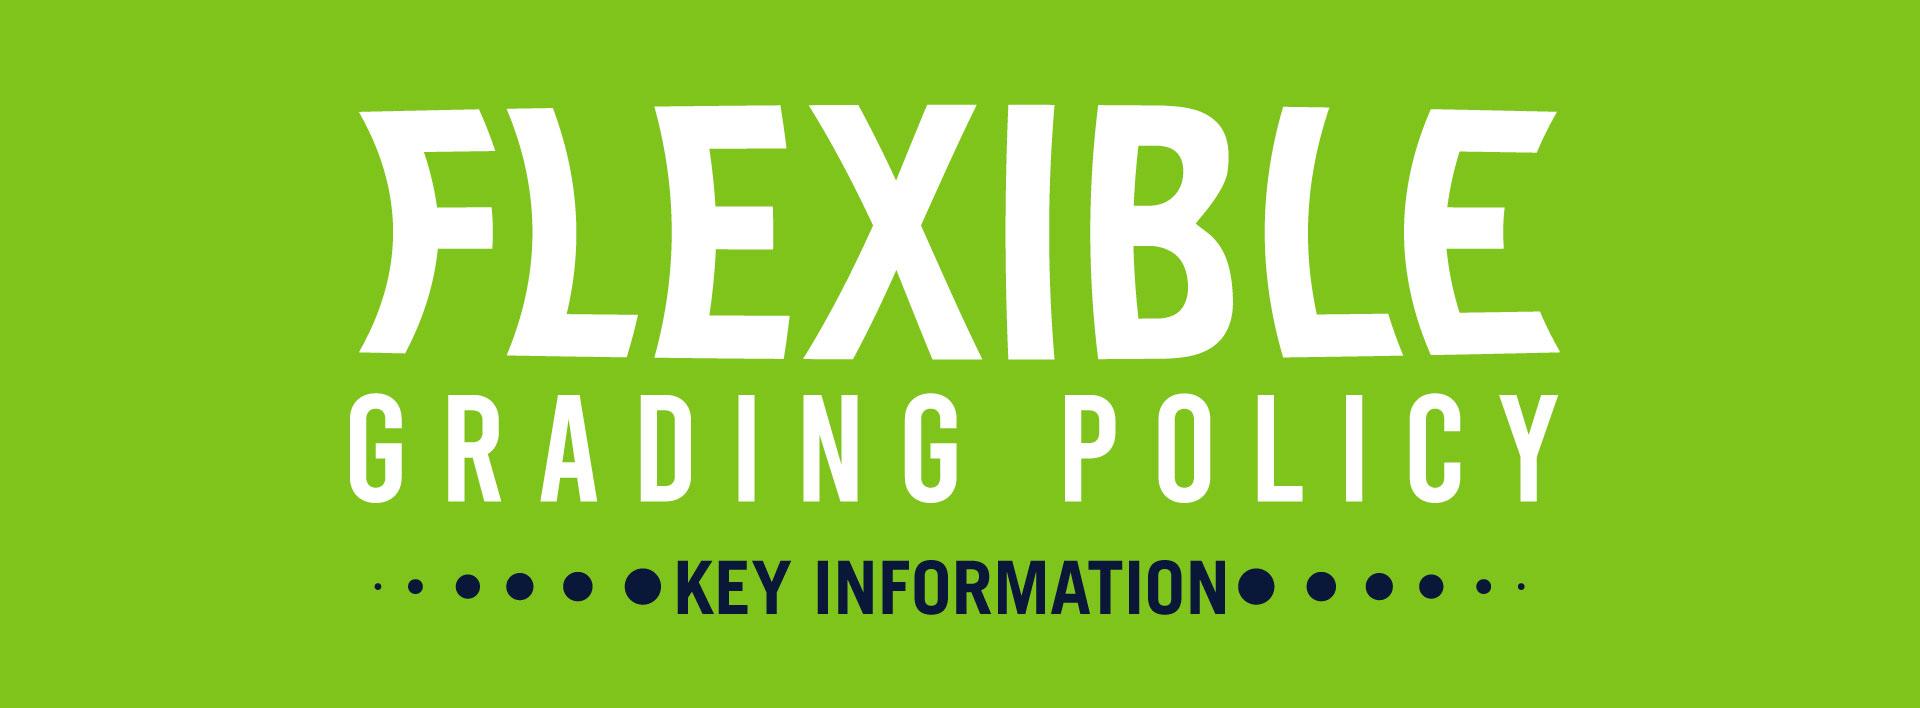 Flexible Grading Policy - key information